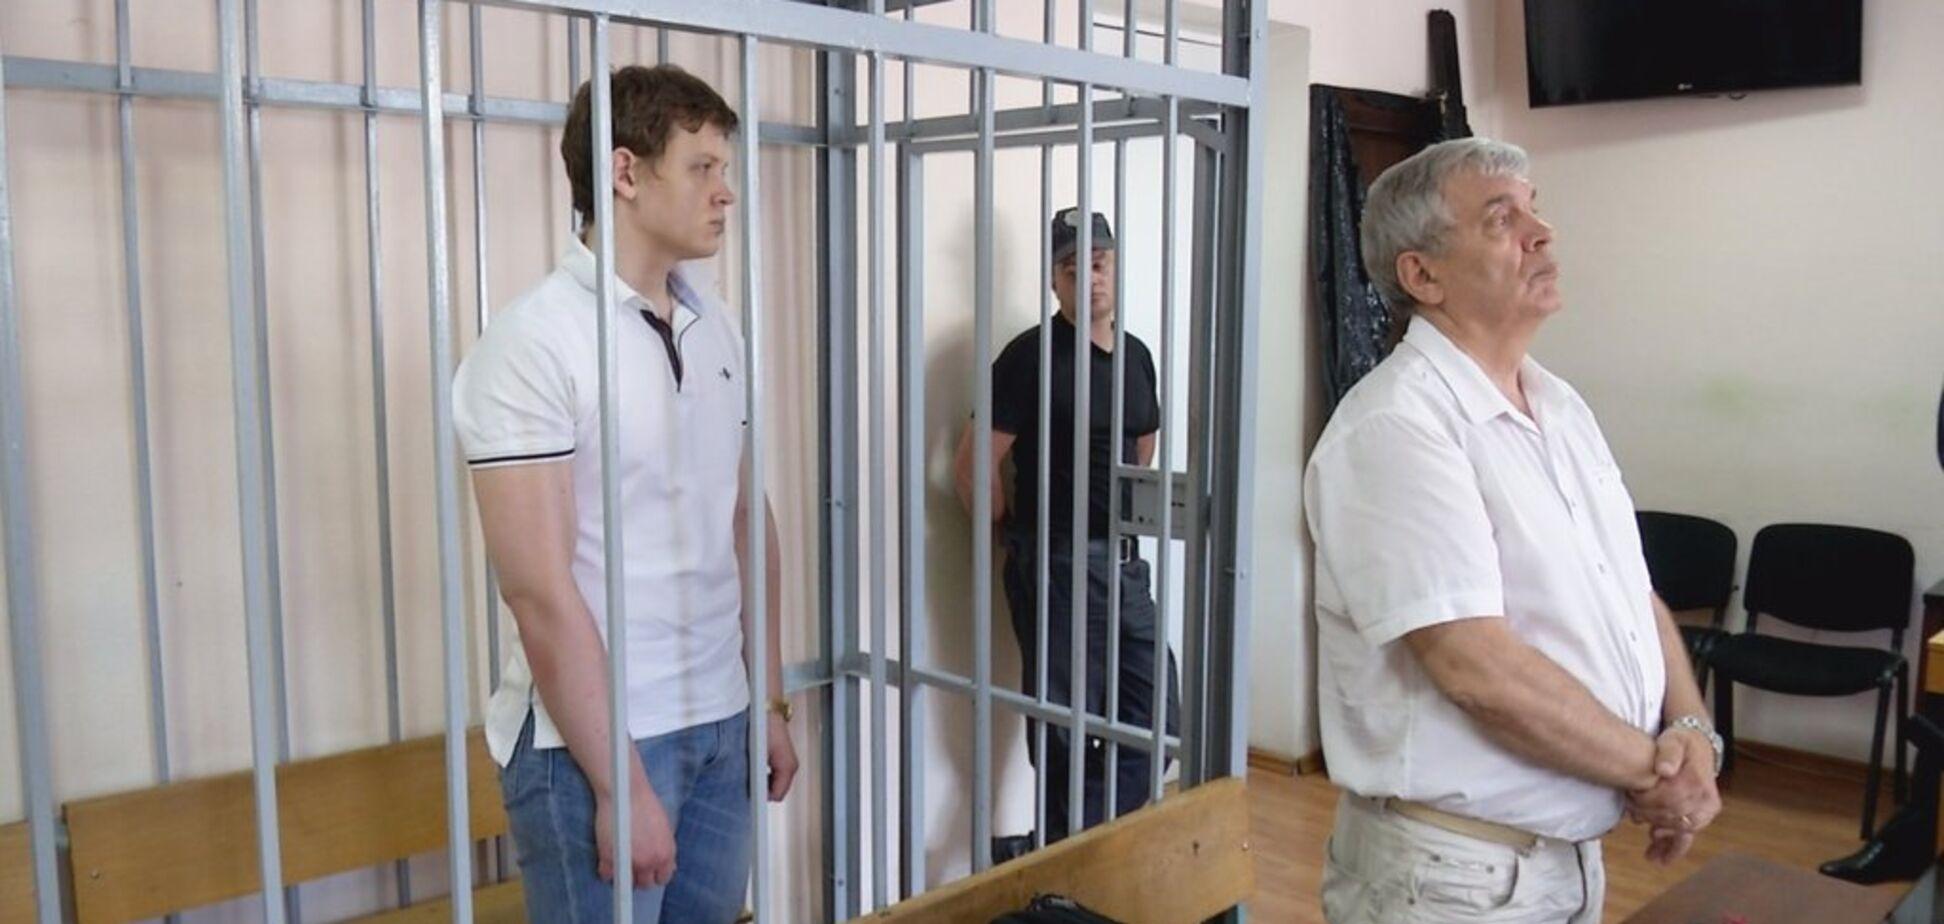 Убийца украинского фотографа вышел на свободу по ''закону Савченко''